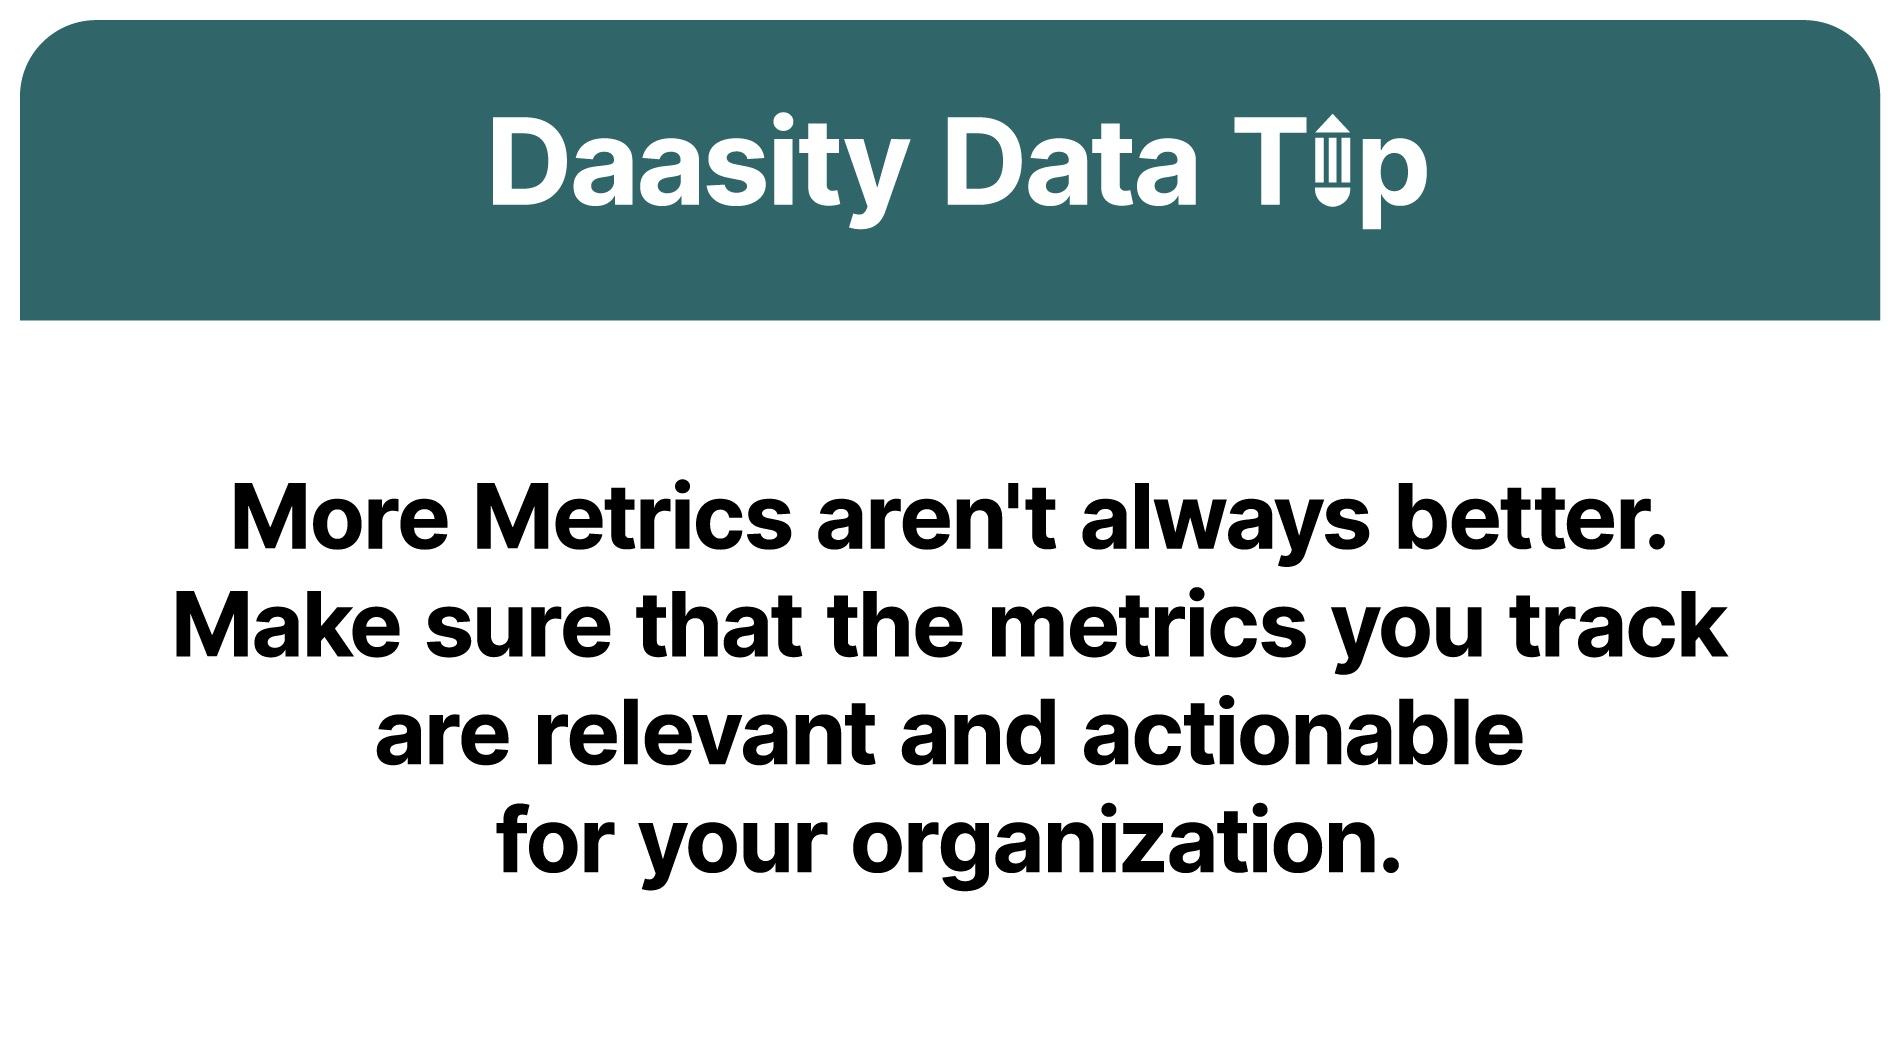 More metrics aren't always better. Make sure you use actionable metrics.